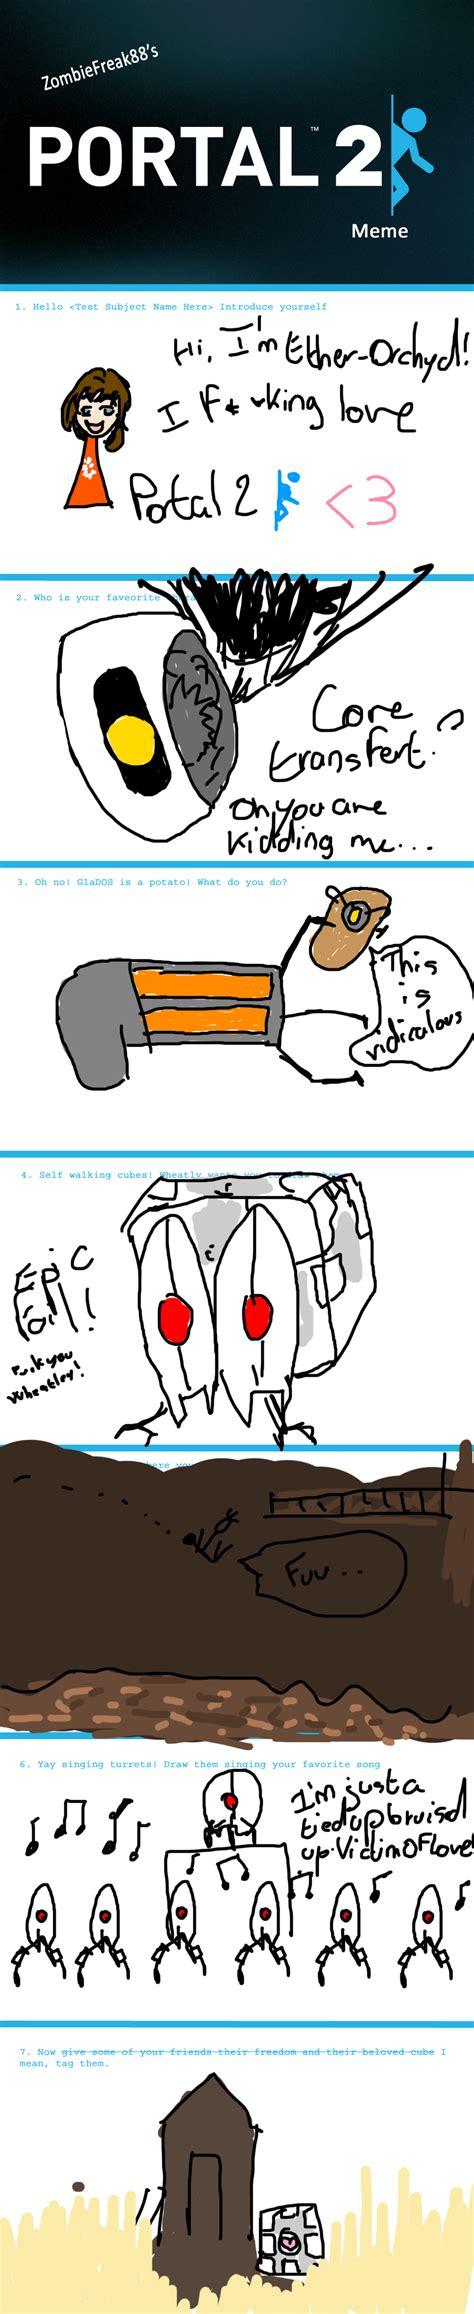 Portal Memes - portal 2 meme 2 by ether orchyd on deviantart